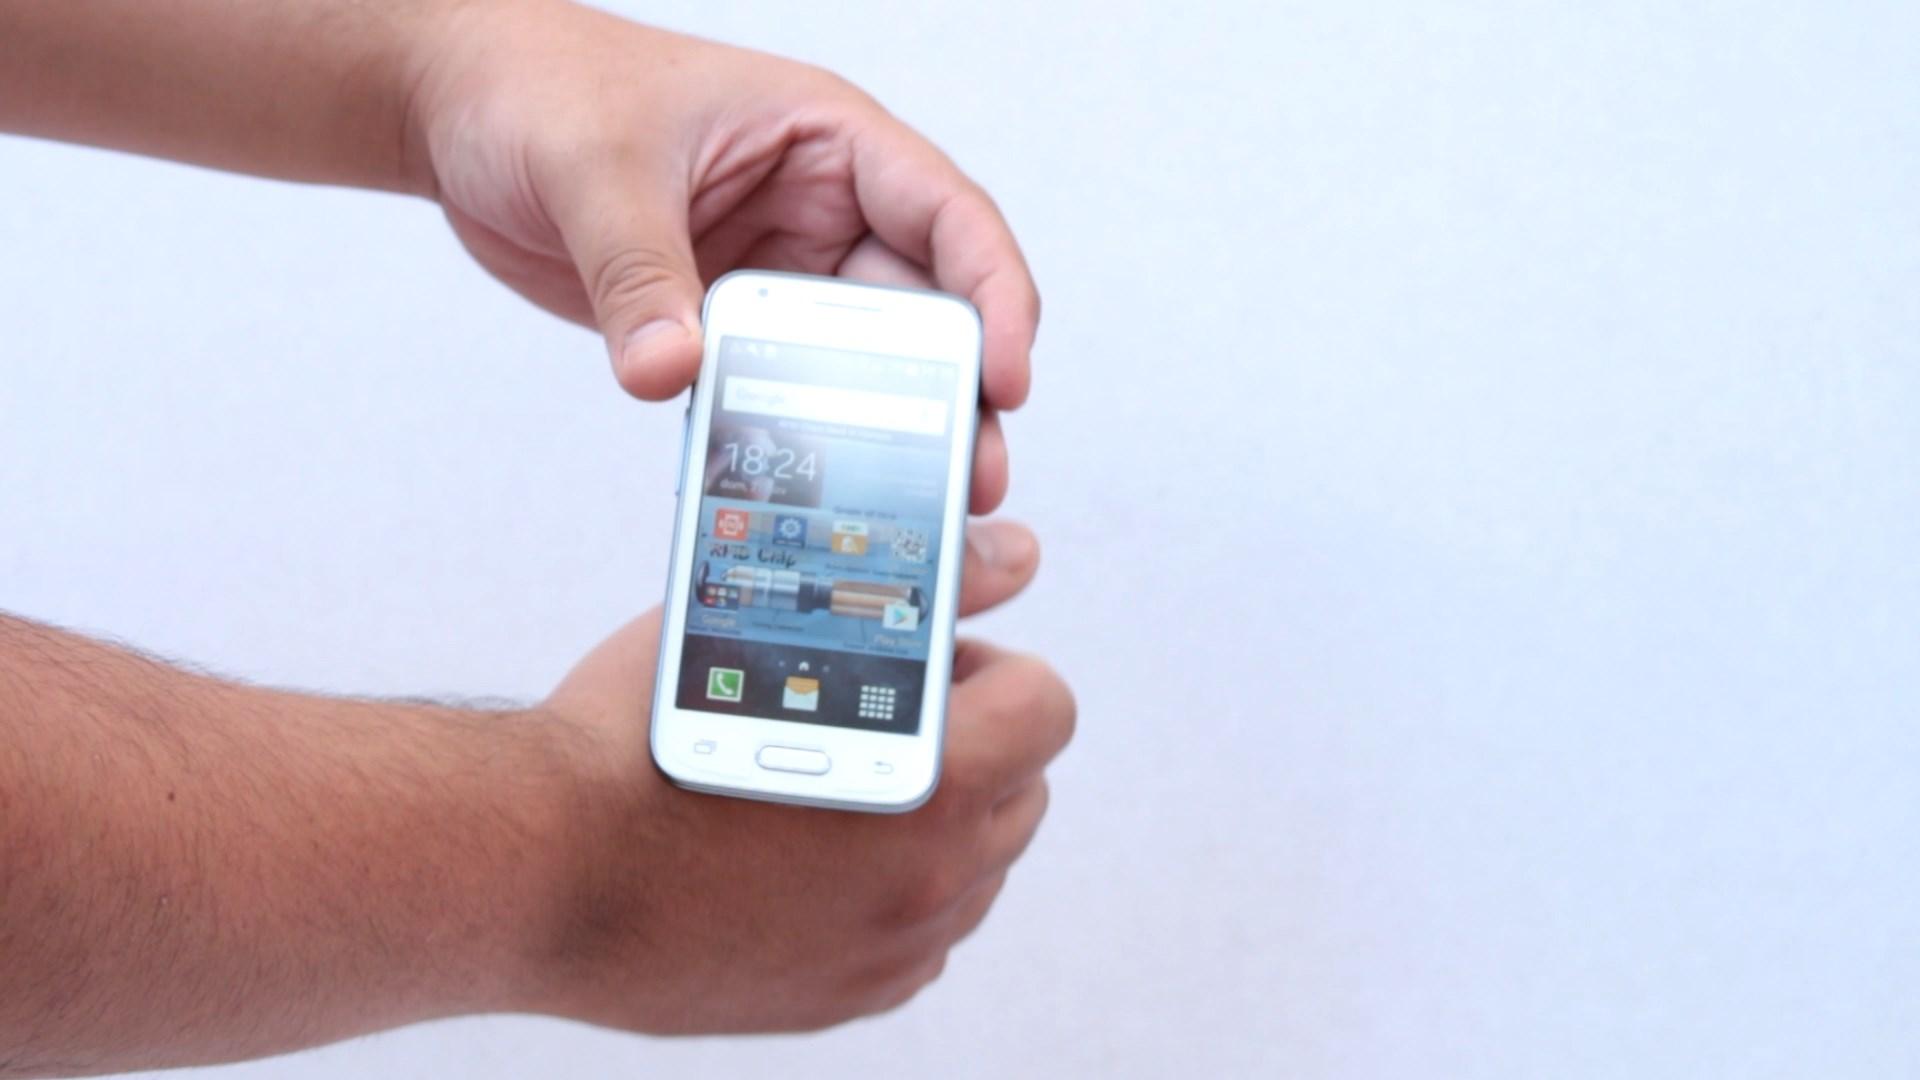 Sistema NFC y RFID Implantable y multifuncional